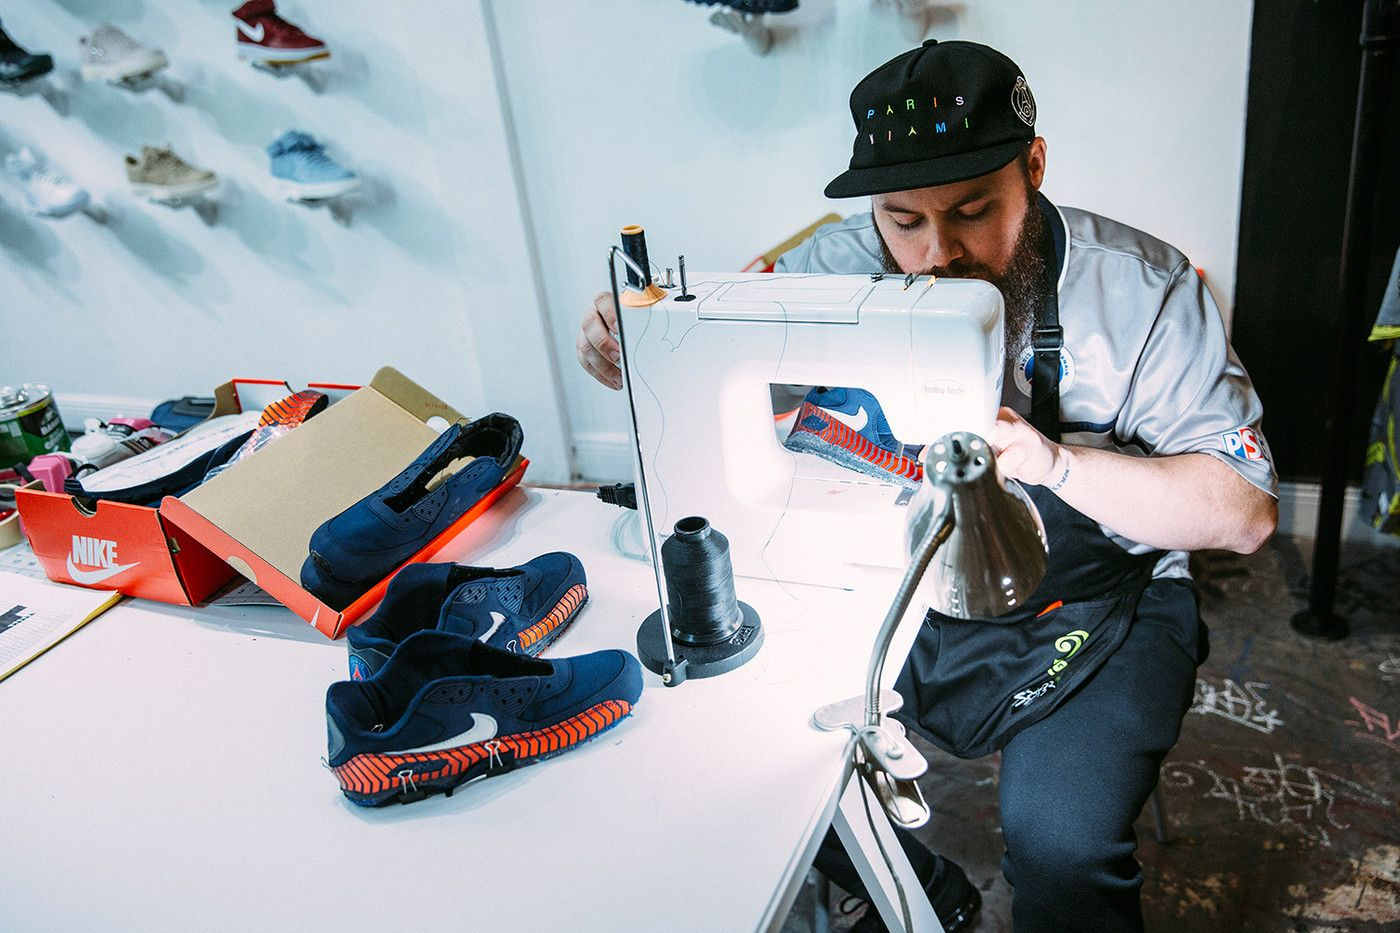 Paris Saint-Germain x Nike Air Max 90 (Tour Custom)